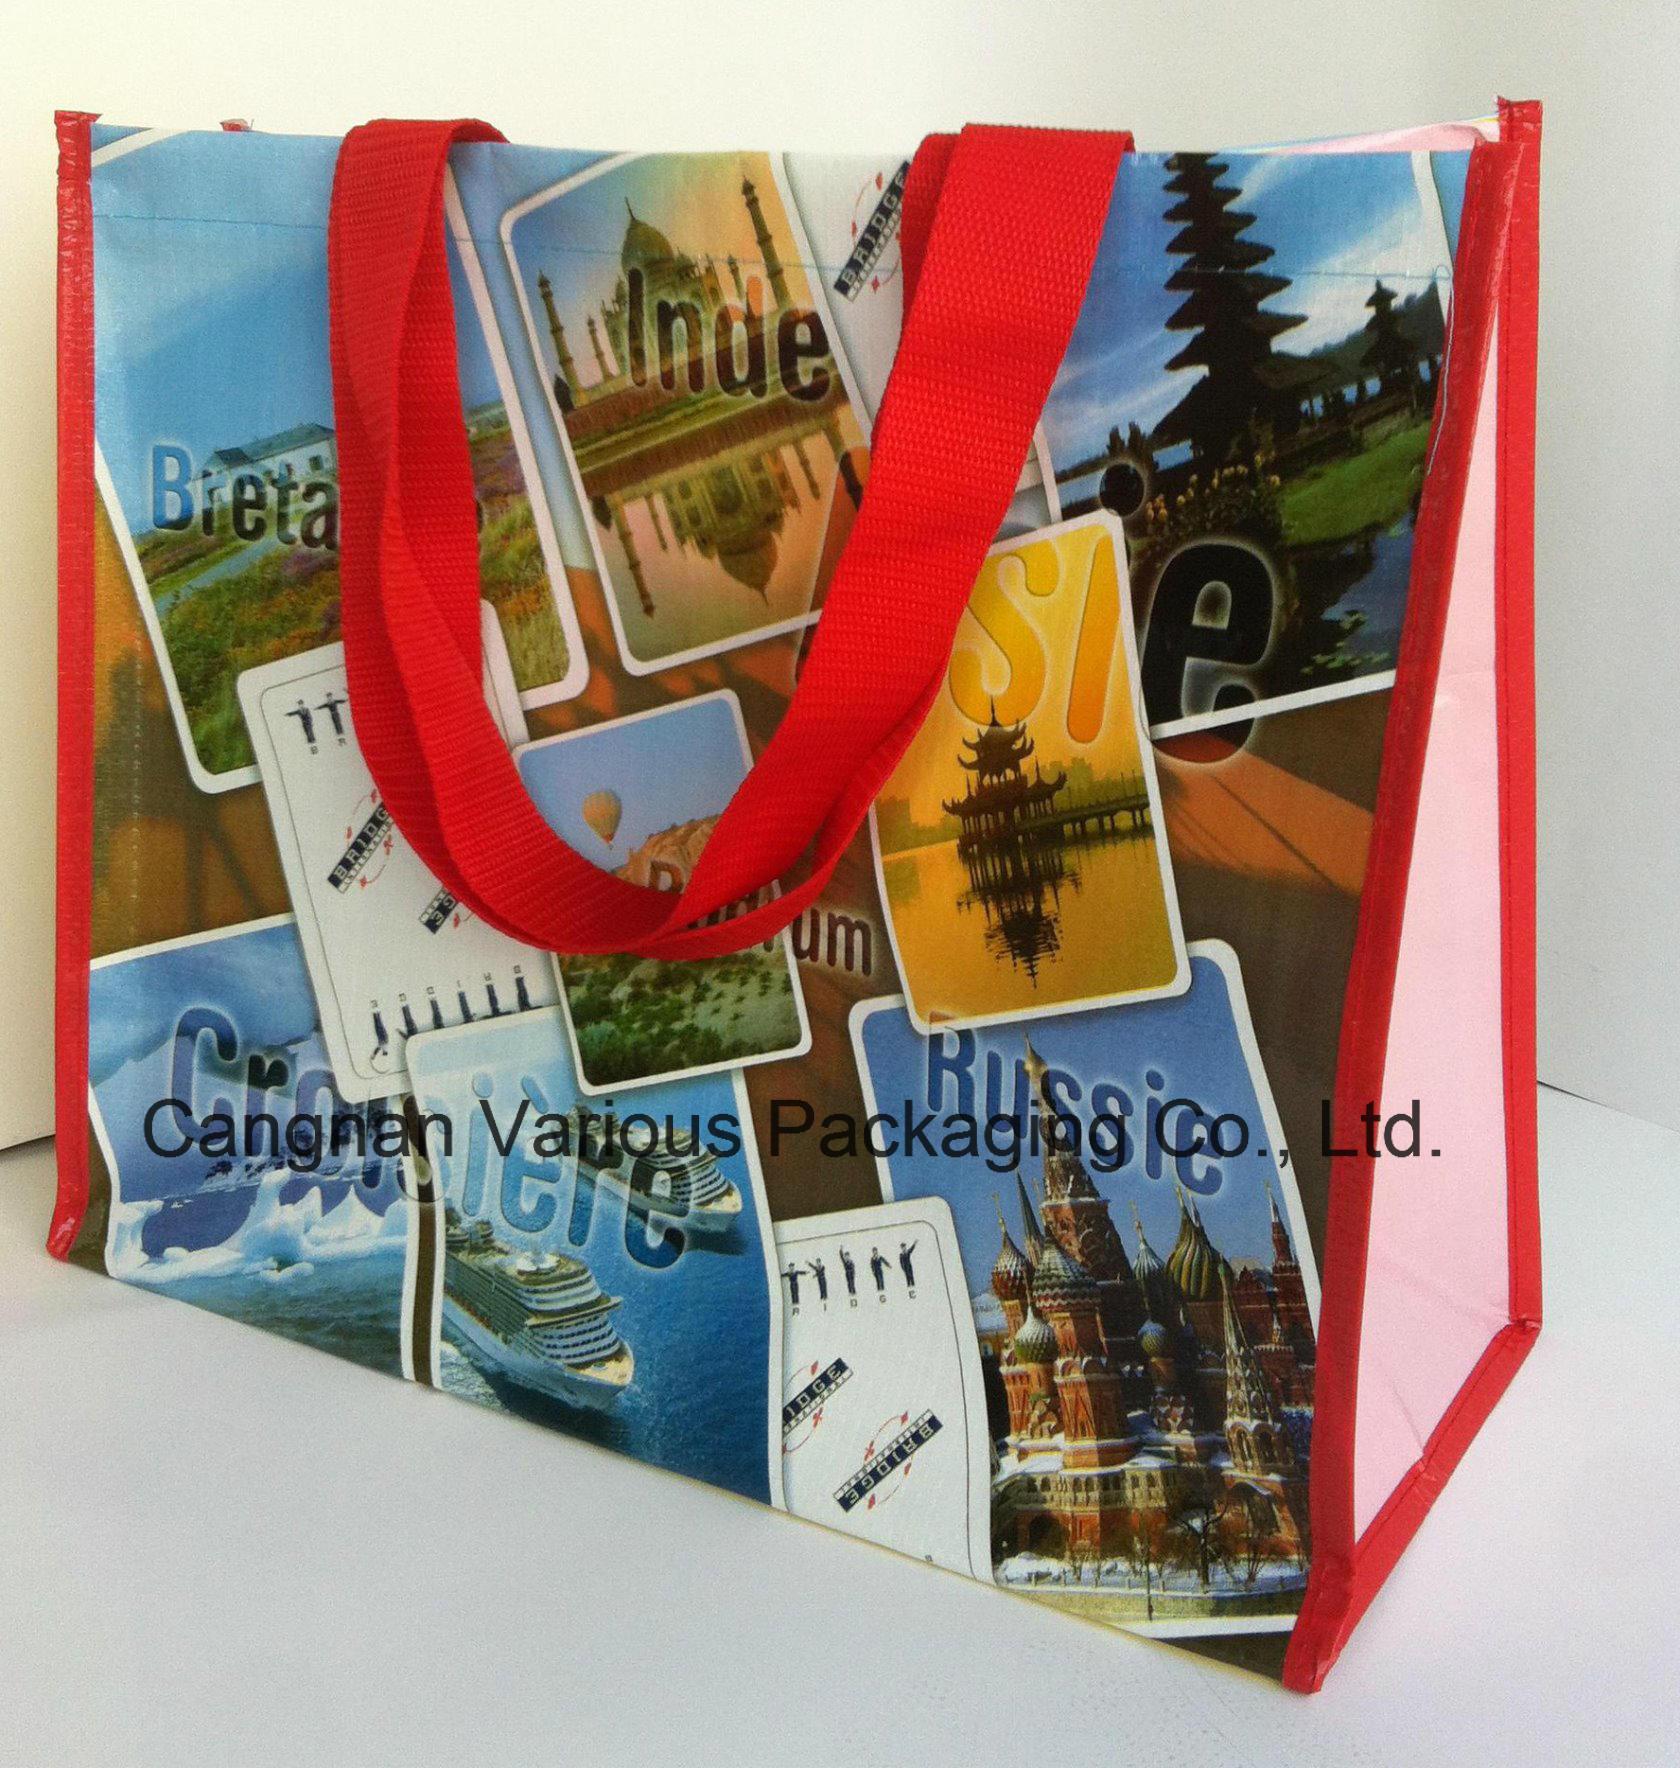 PP Woven Shopping Bag, Tote Bag